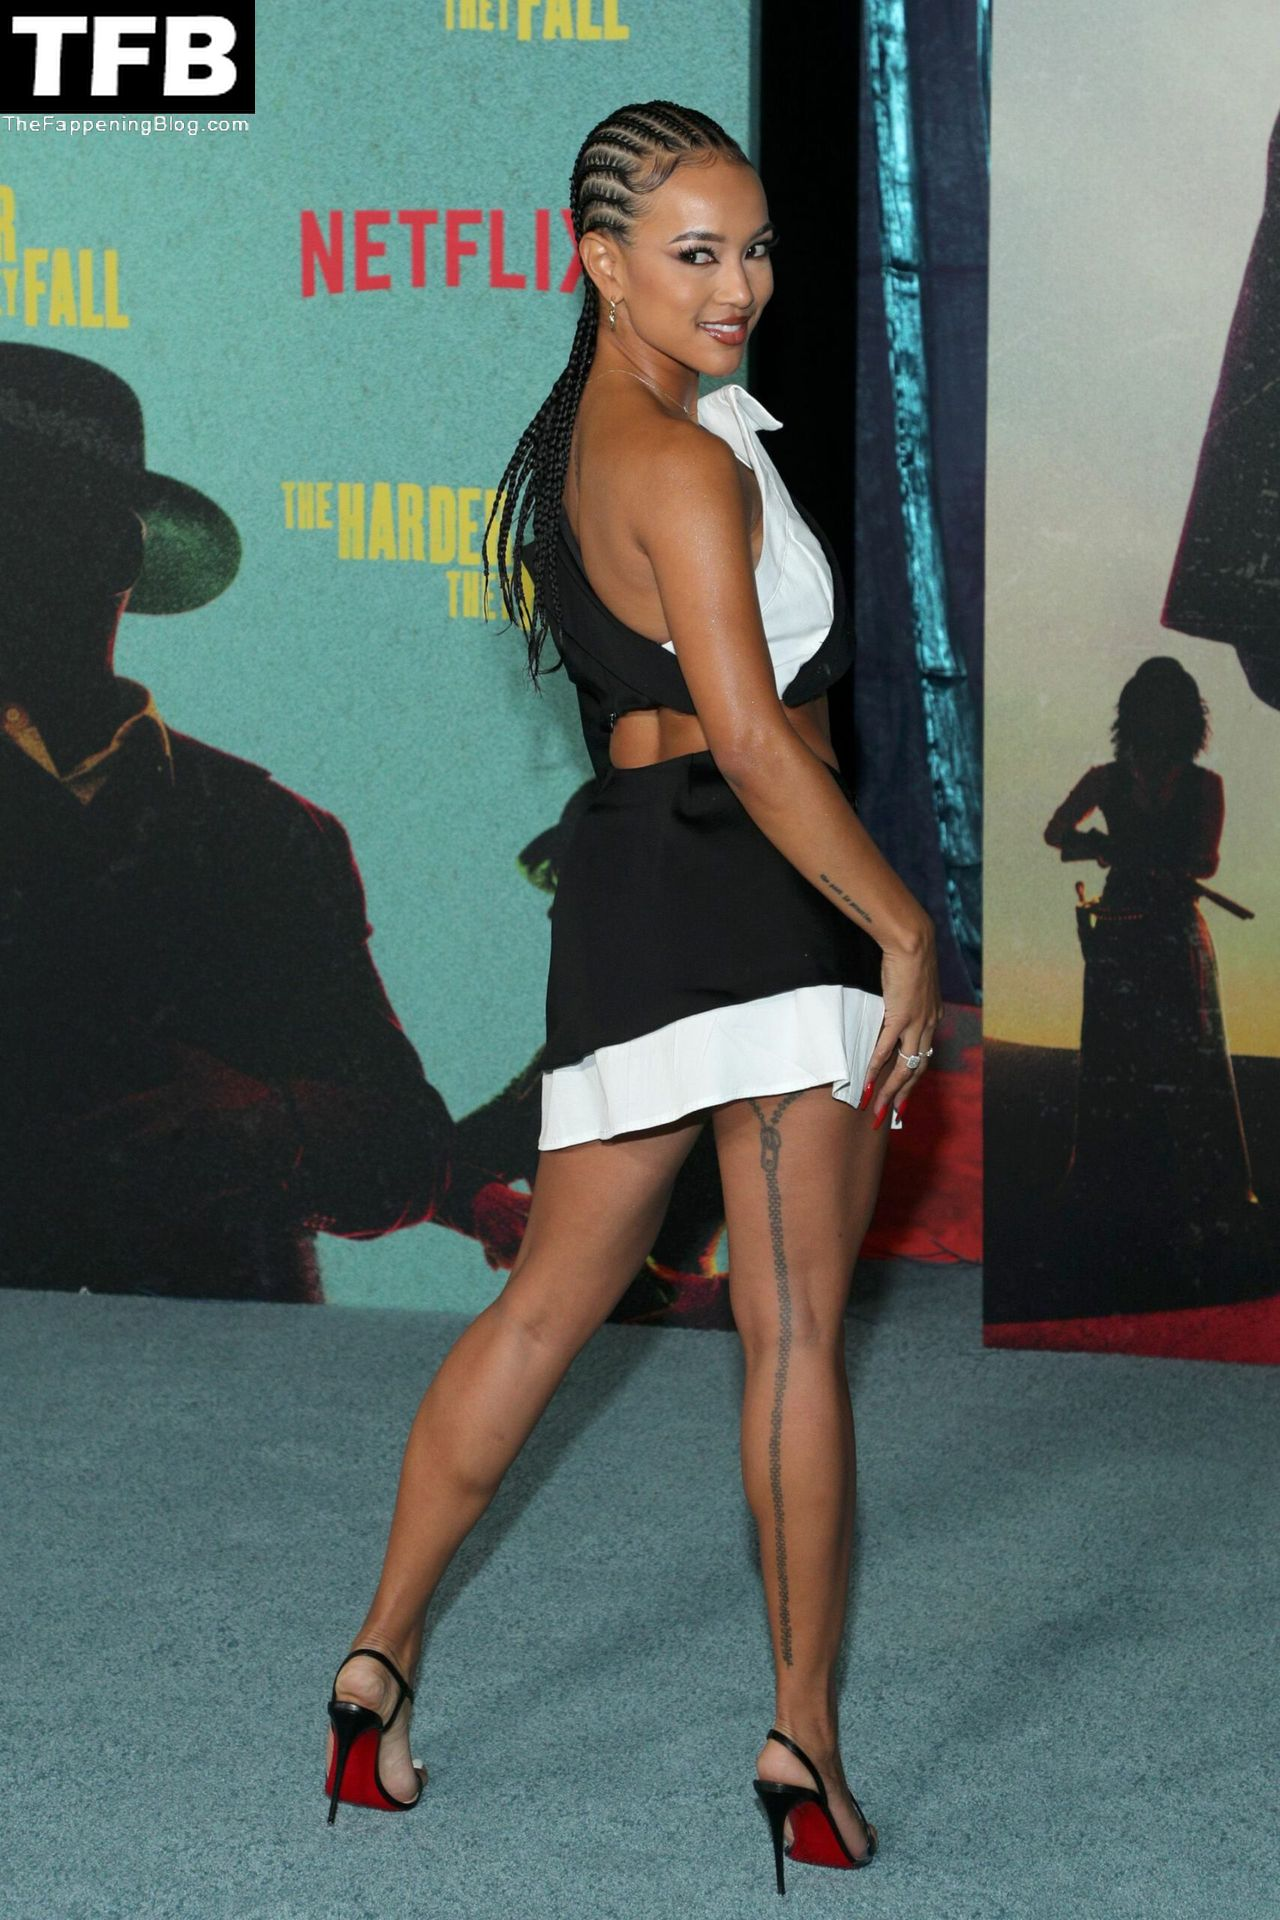 Karrueche-Tran-Sexy-Legs-Upskirt-The-Fappening-Blog-21.jpg